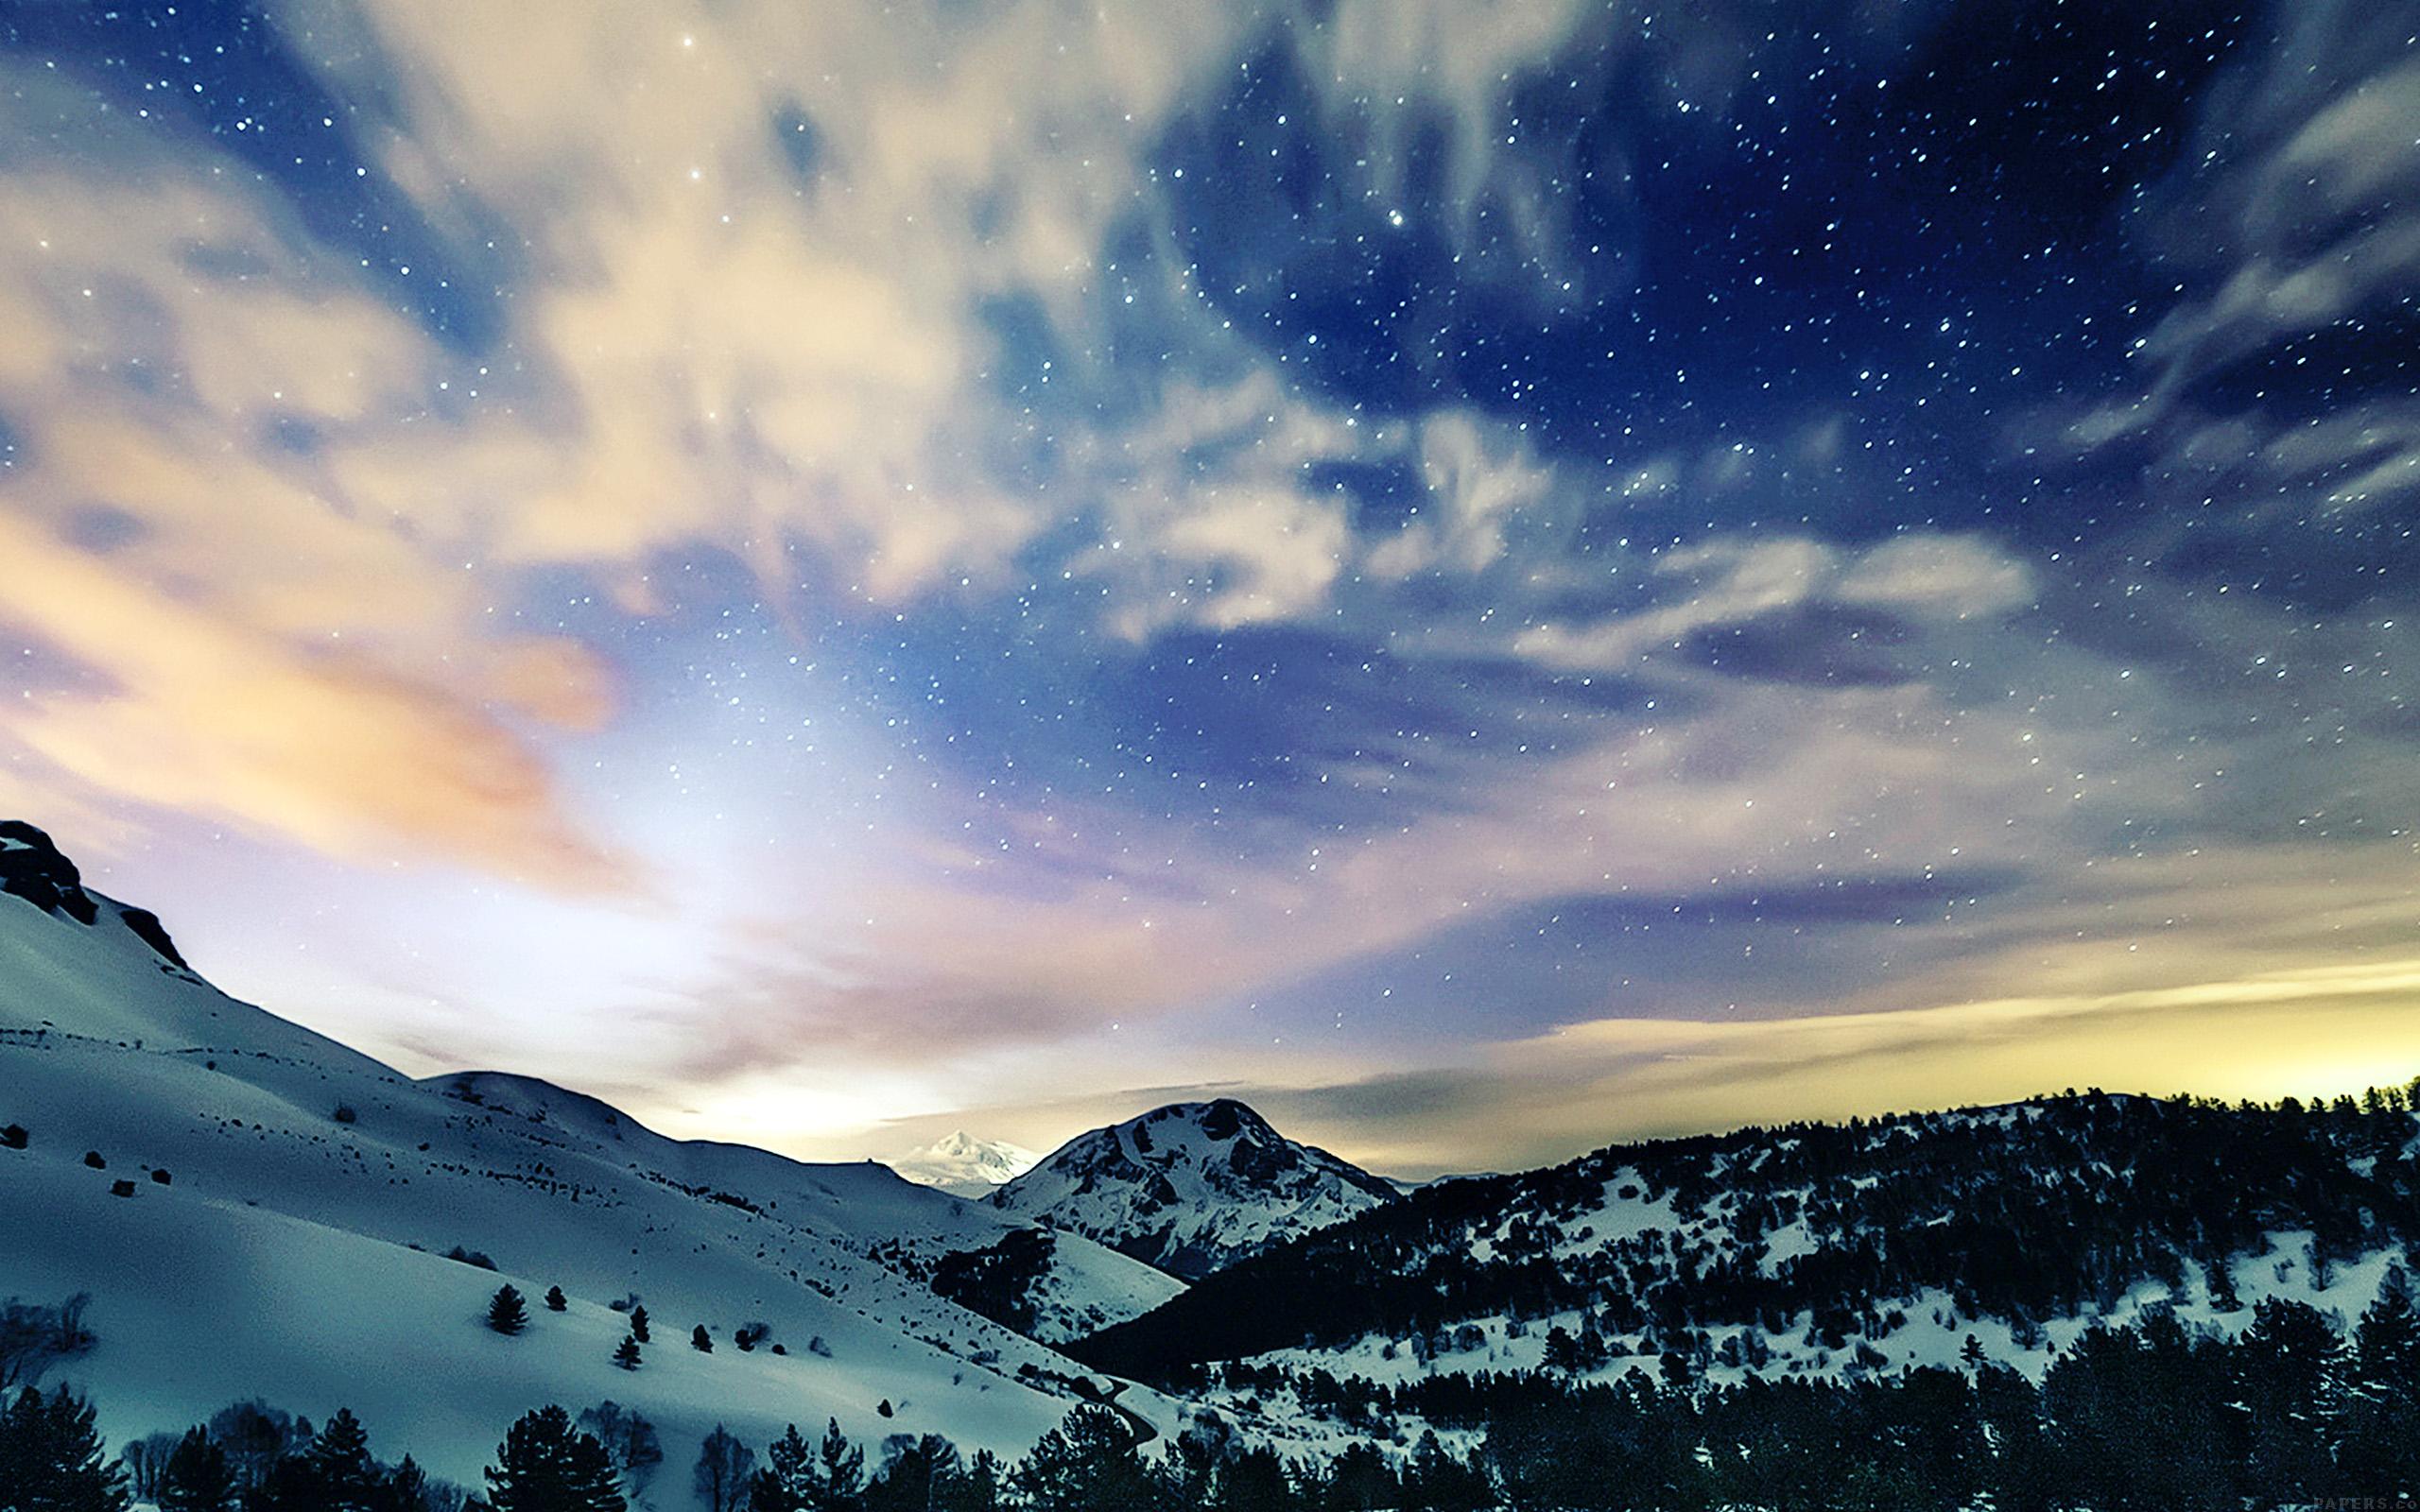 mk79-aurora-star-sky-snow-night-mountain-winter-nature ...